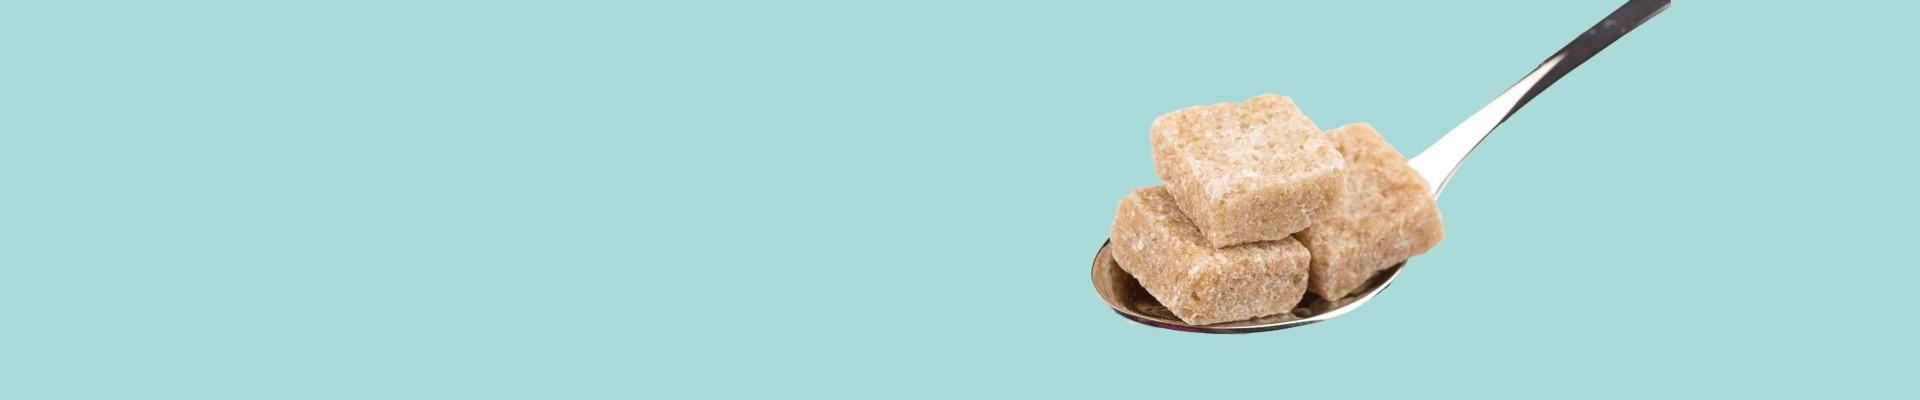 Jual Kaldu & Penyedap Rasa Ayam Sapi Lengkap Harga Grosir